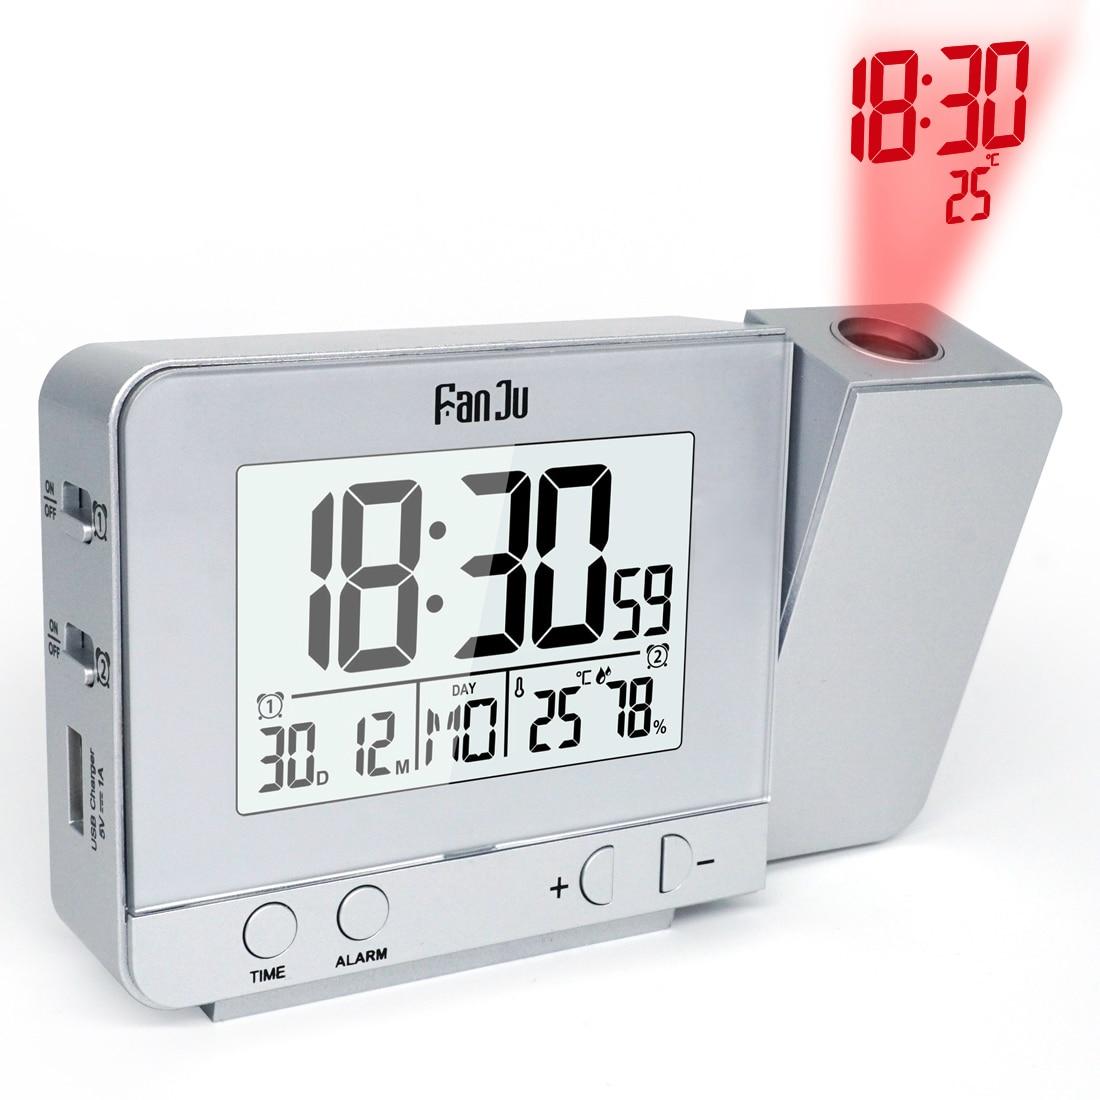 FanJu Digital Snooze Alarm Clock Projection Function Backlight Projector Desk Table FJ3531 Hot